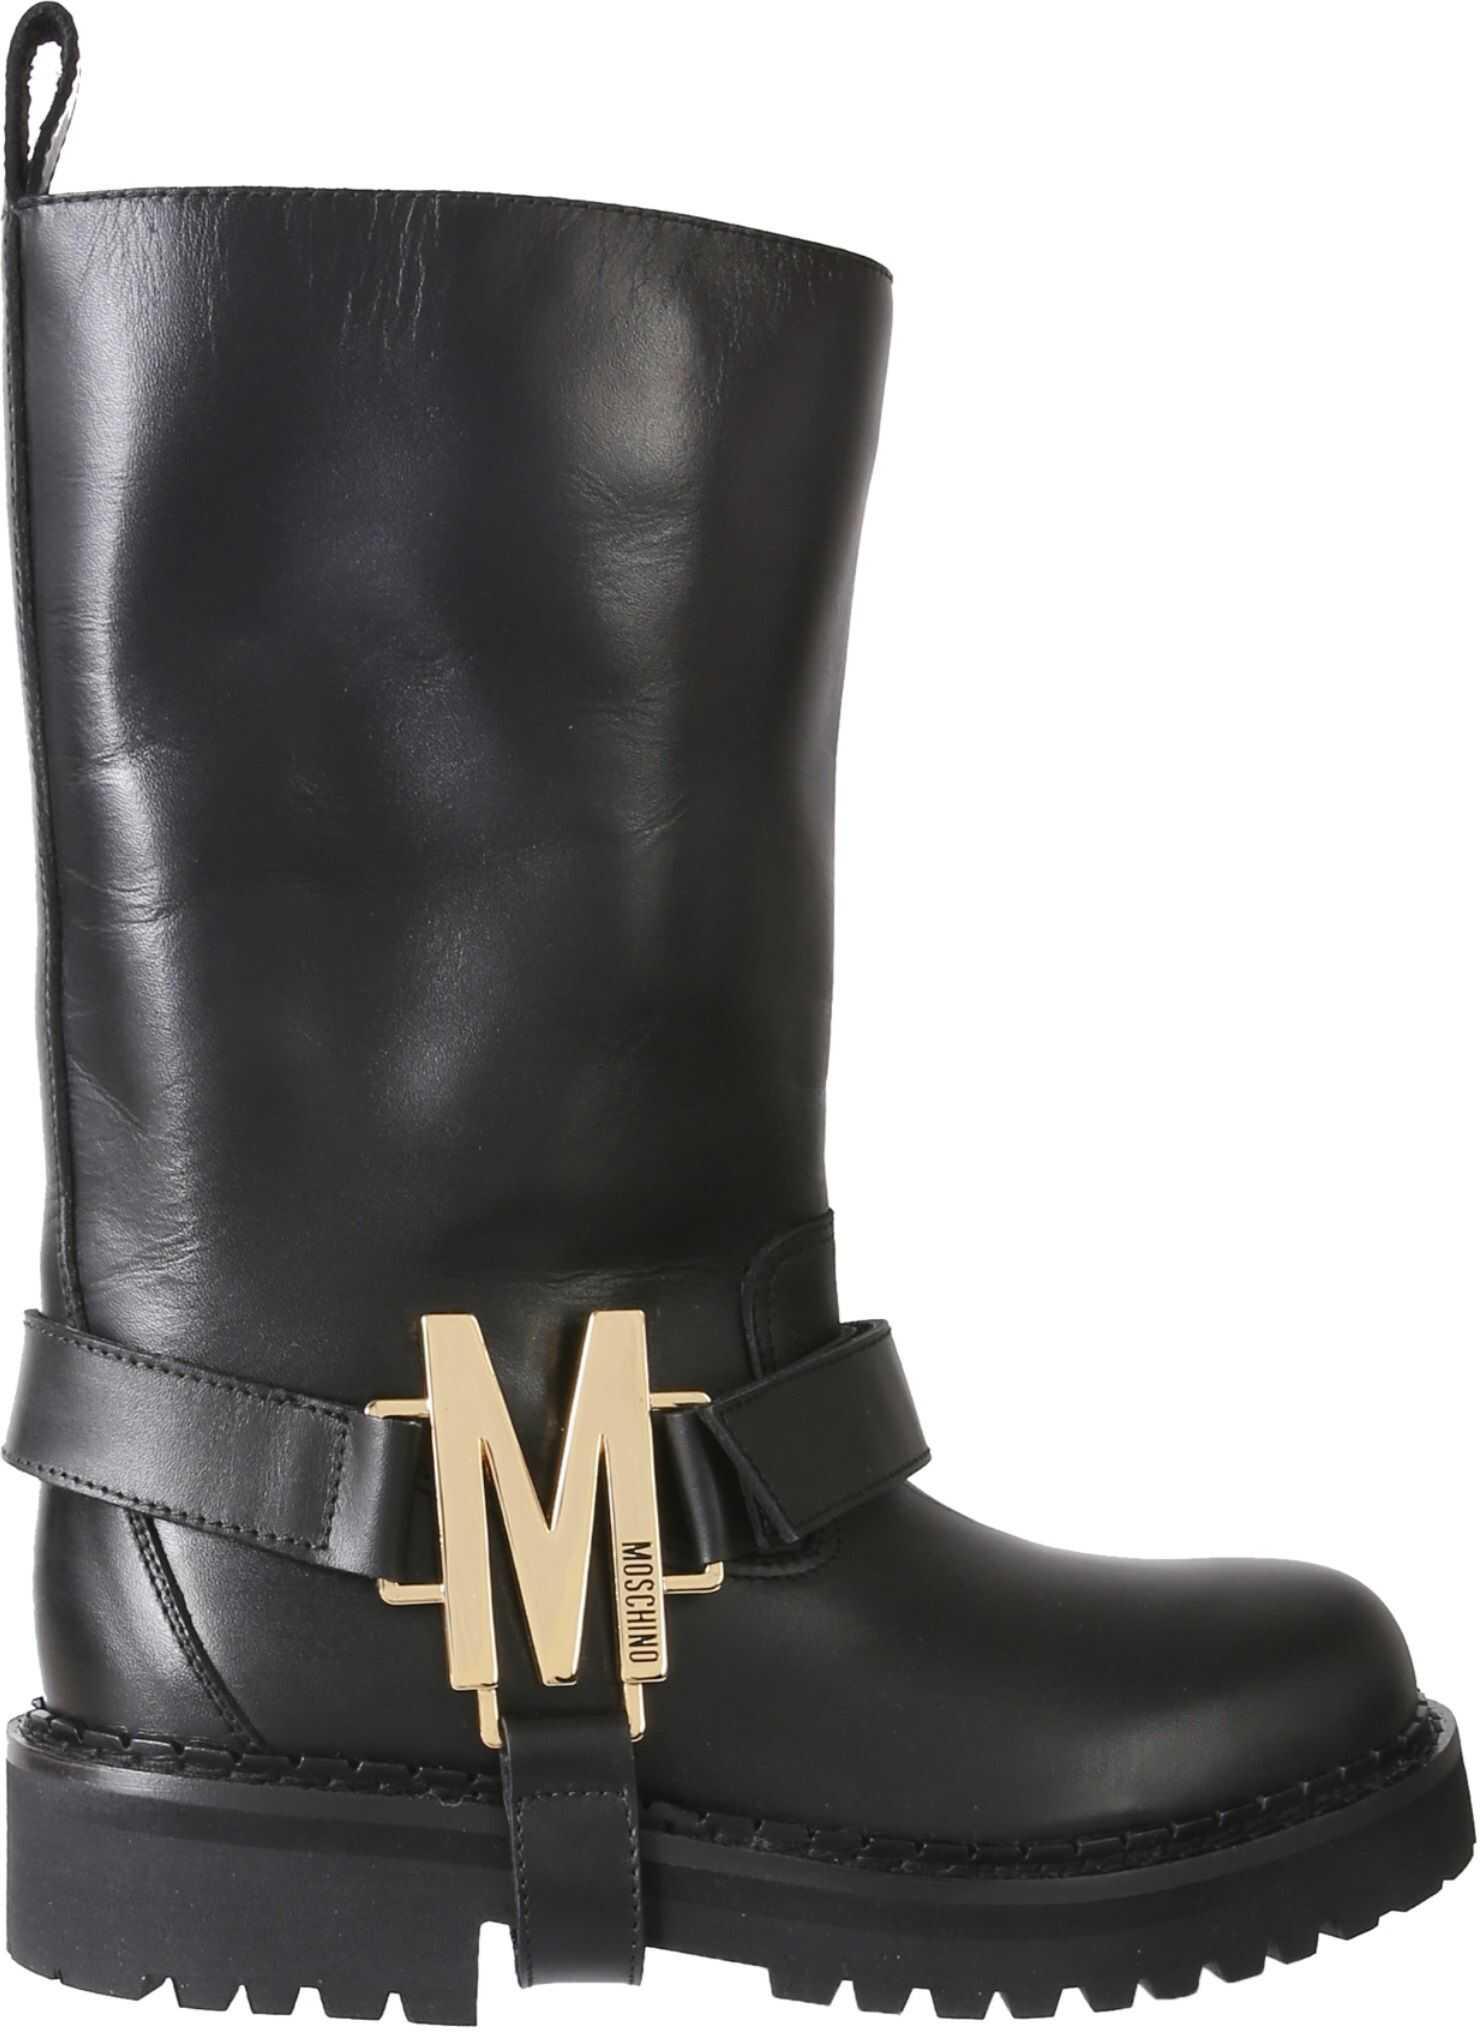 Moschino Biker Boots MA24105G0BMF0_000 BLACK imagine b-mall.ro